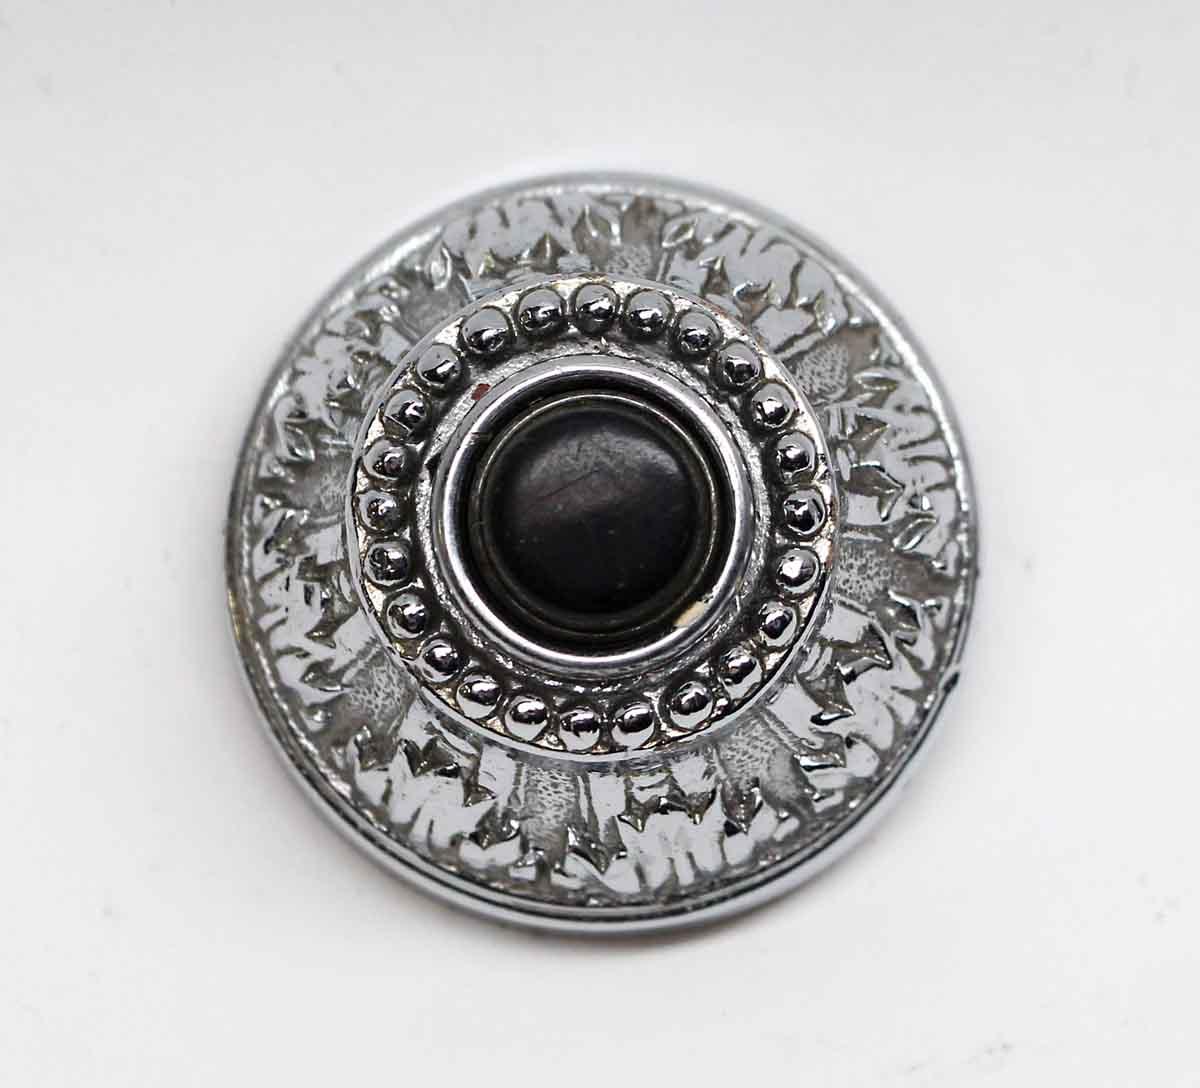 Charmant Knockers U0026 Door Bells   Silver Plated Ornate Doorbells With Black Button